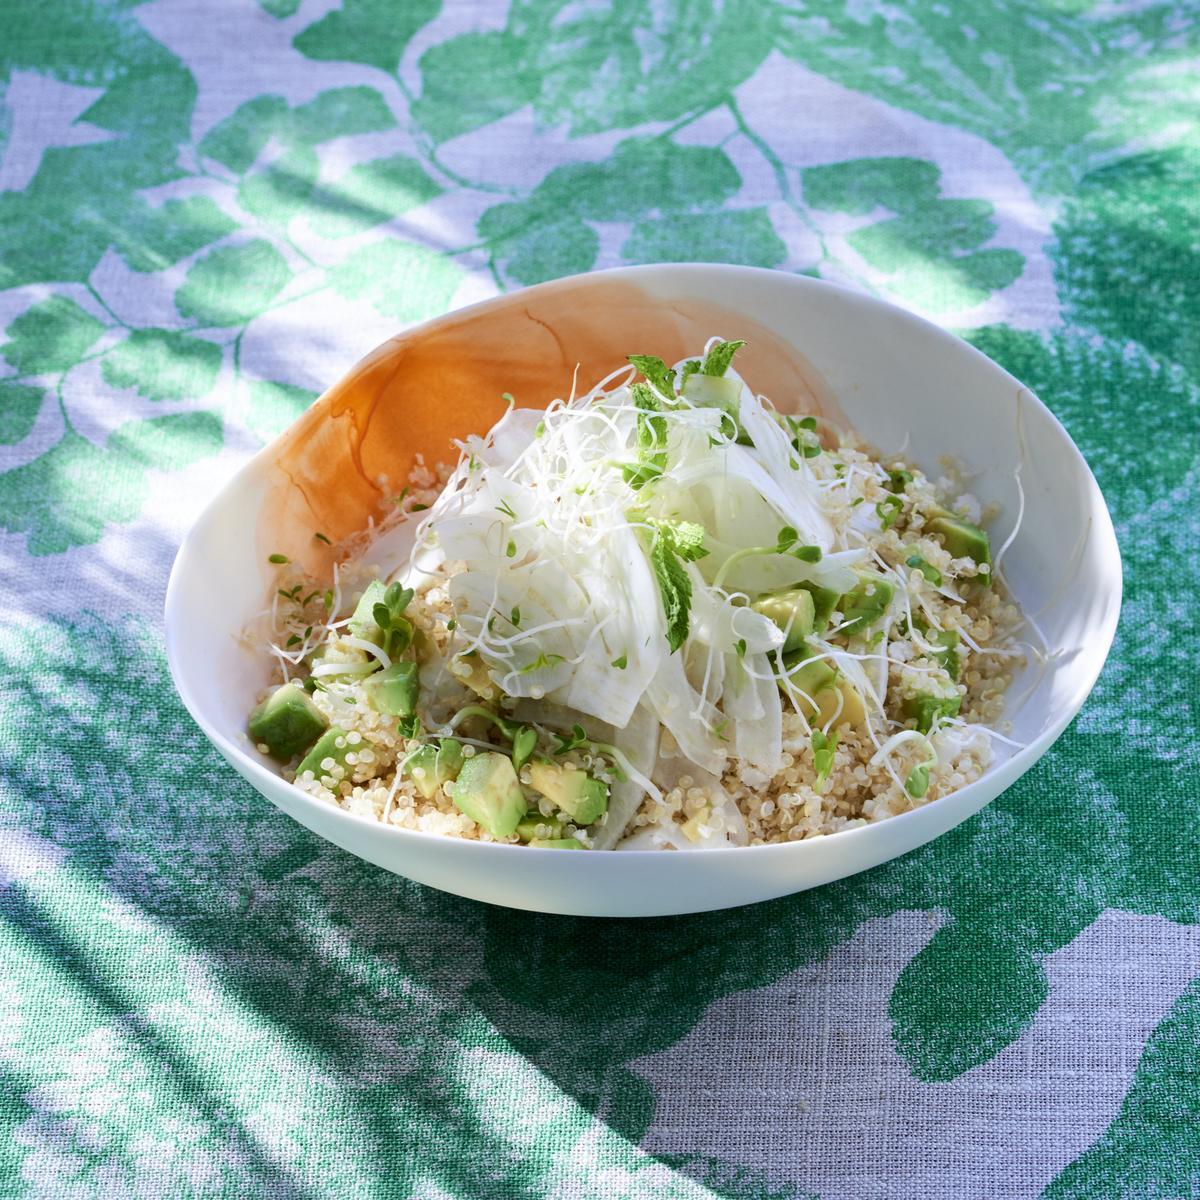 recette salade vivante au quinoa cuisine madame figaro. Black Bedroom Furniture Sets. Home Design Ideas